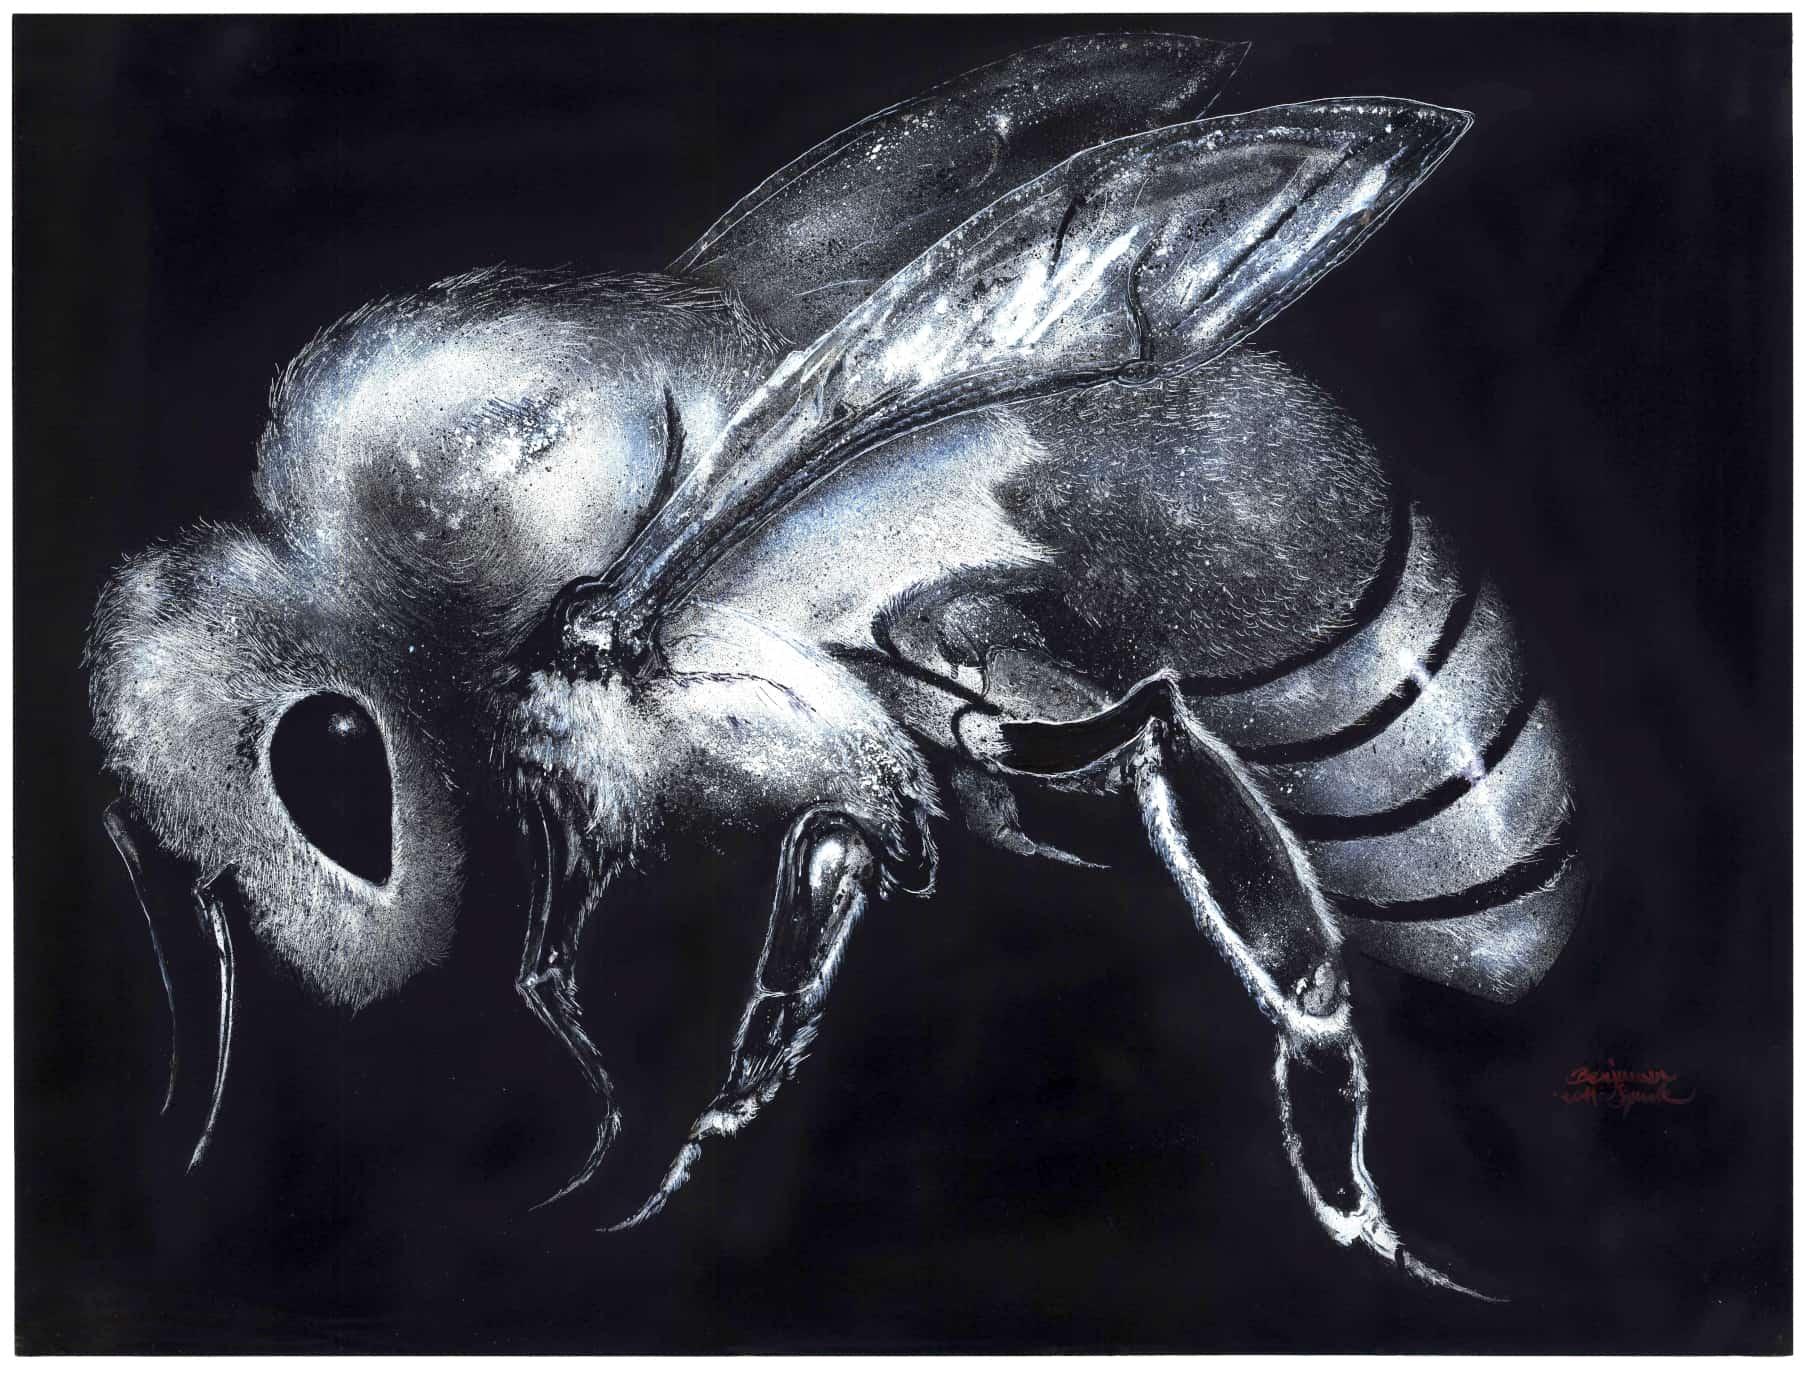 Bienen Universum kompri by Xin One